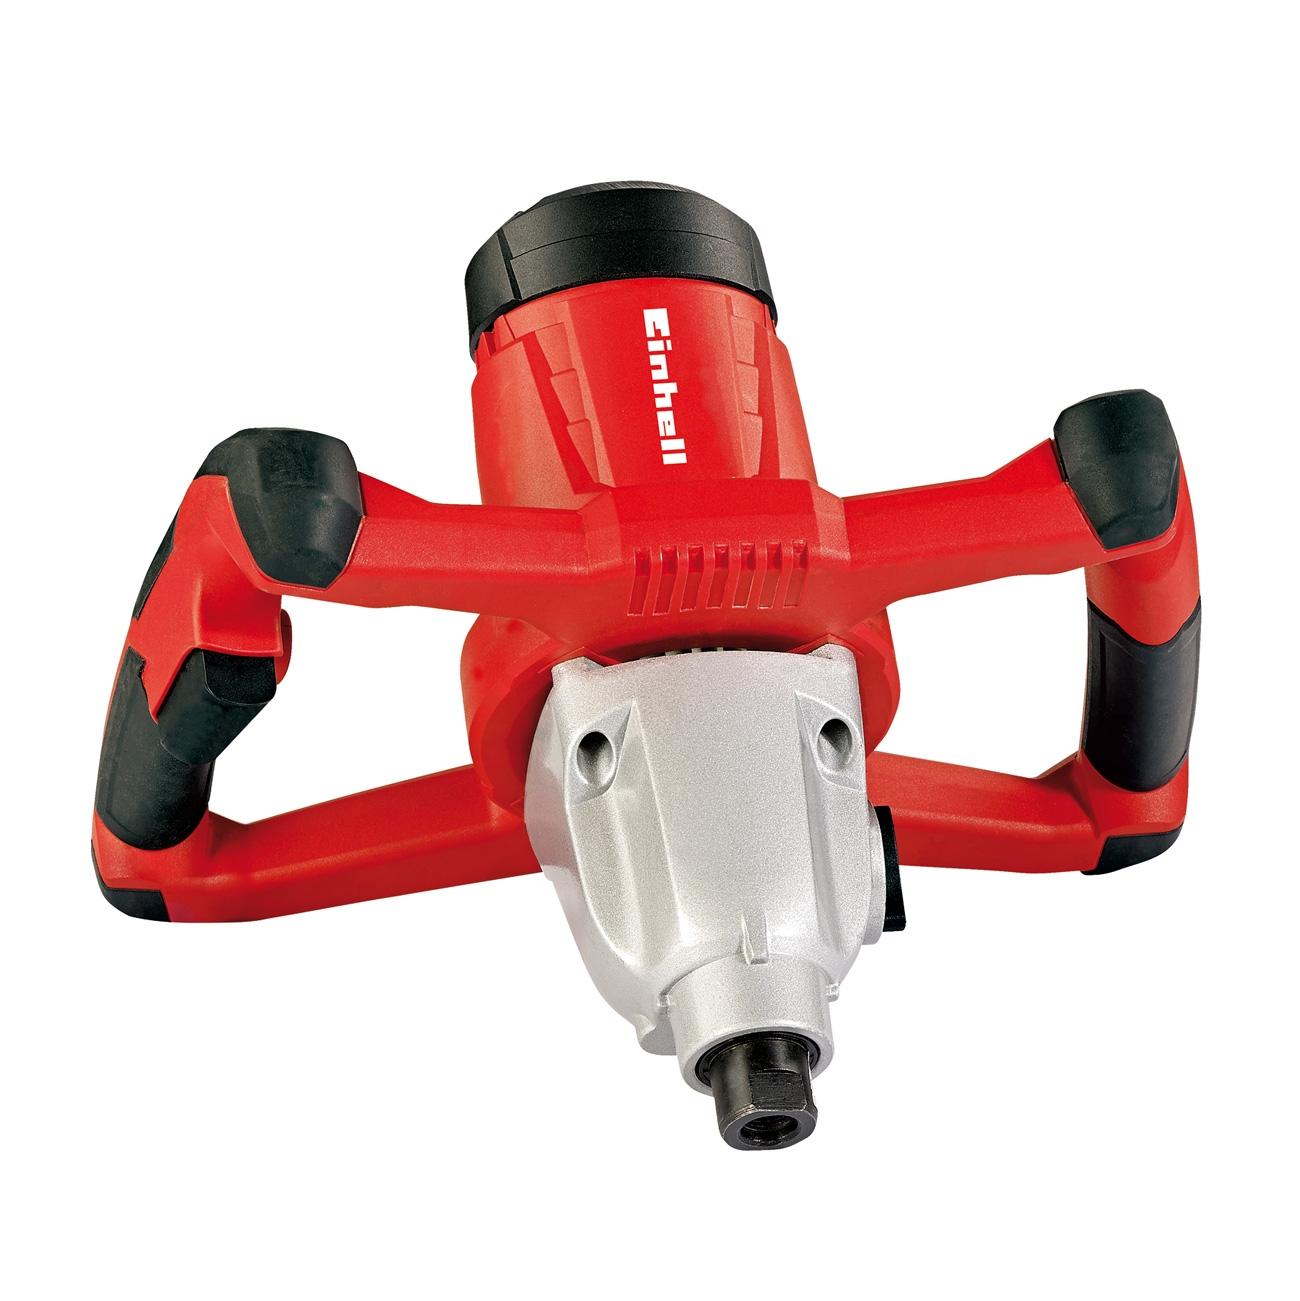 Image of Trapano miscelatore Einhell TC-MX 1400-2 E